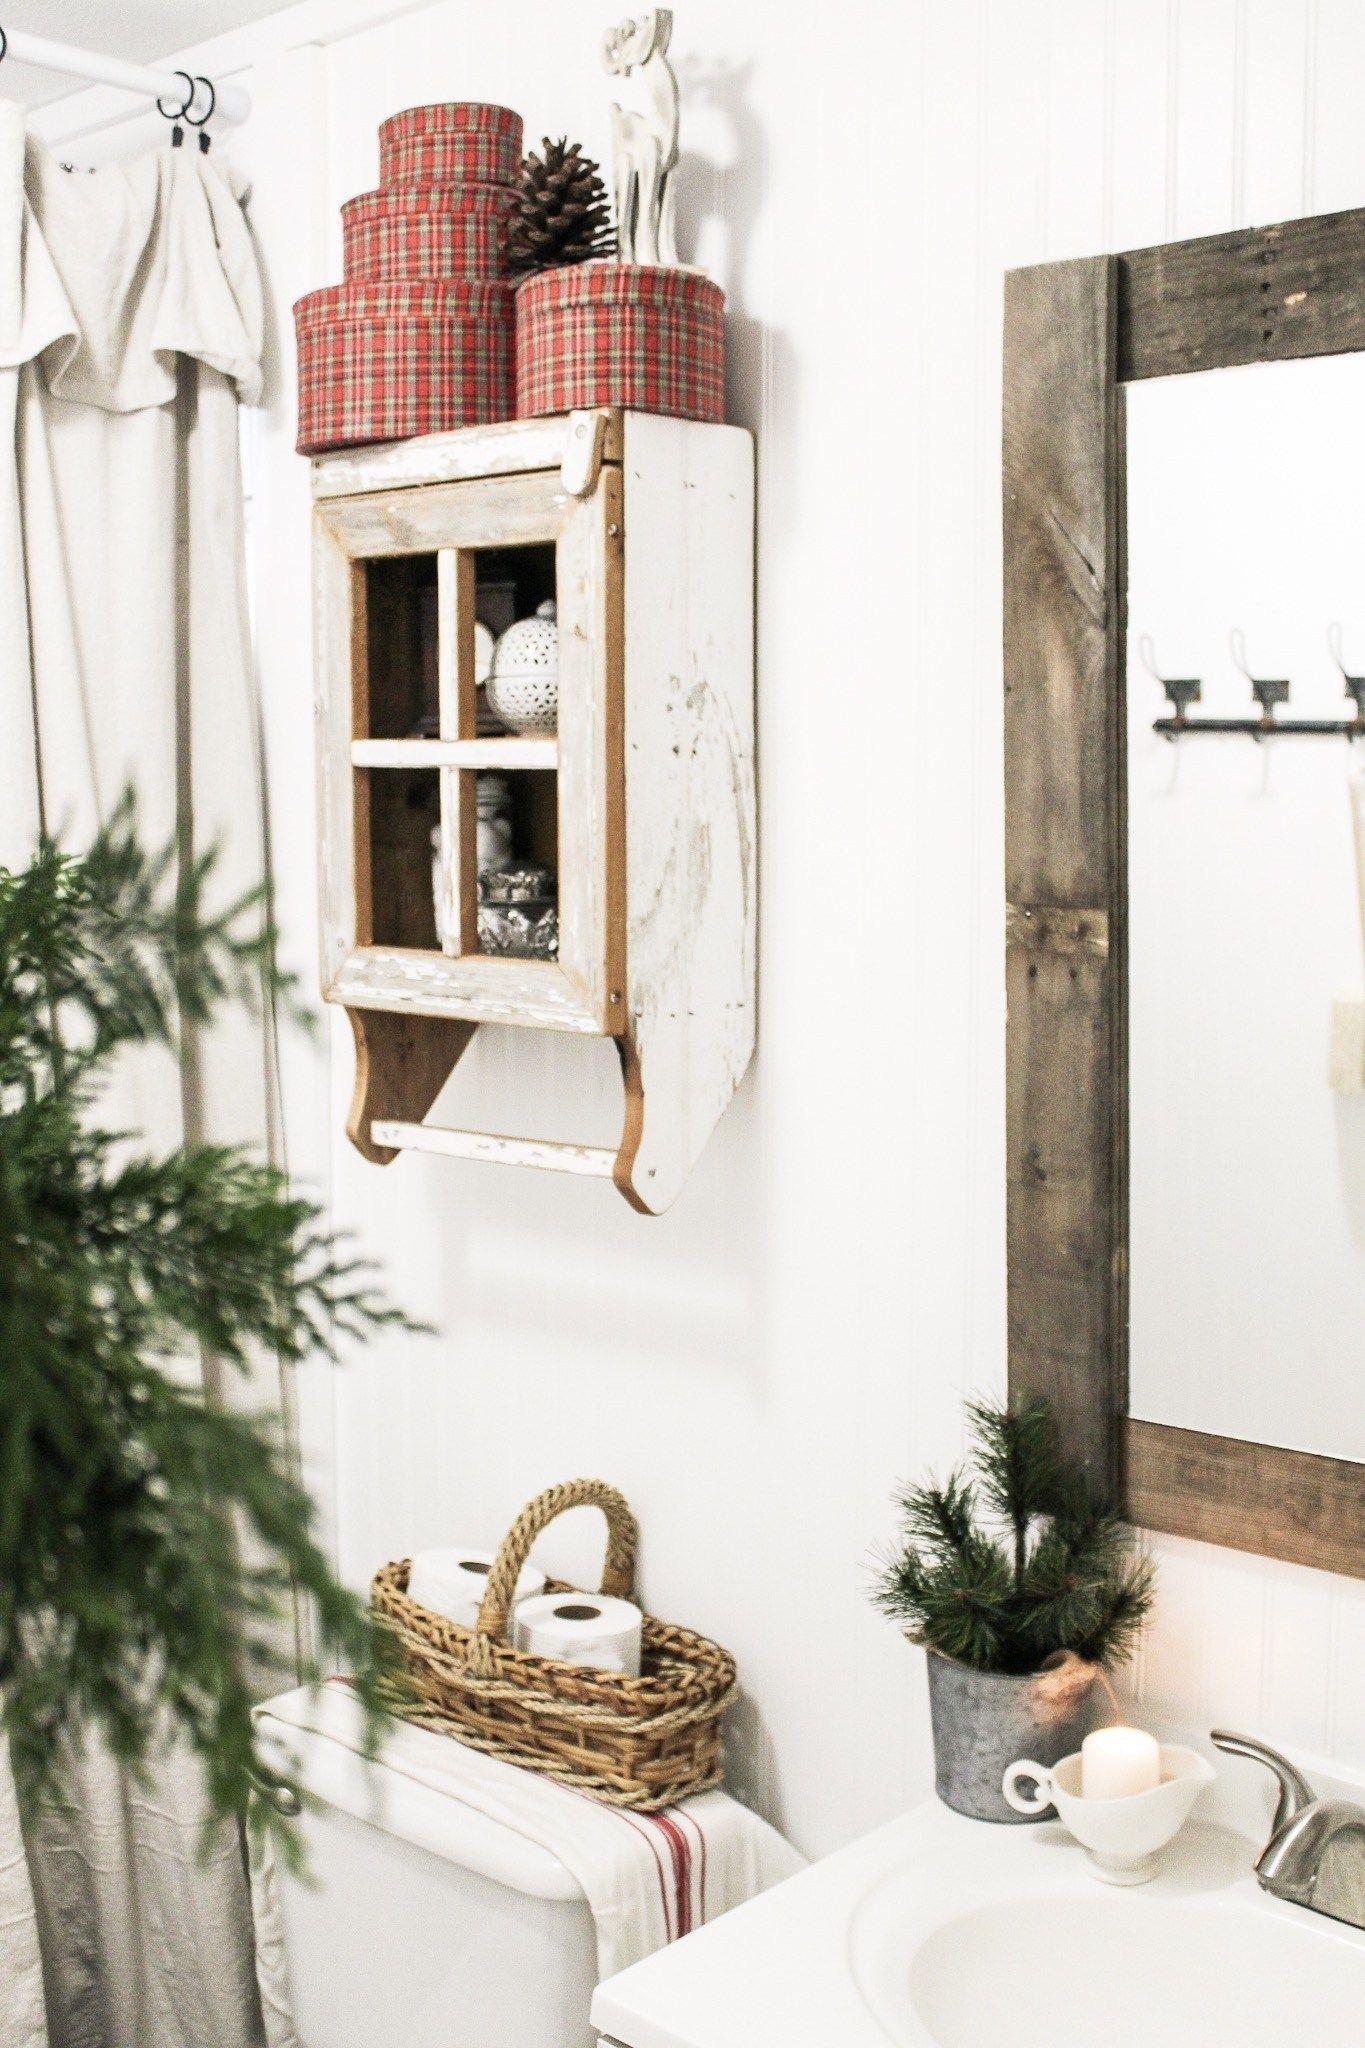 The Best Farmhouse Decor To Buy At Thrift Stores Lainey Drew Christmas Bathroom Decor Farmhouse Bathroom Decor Christmas Bathroom